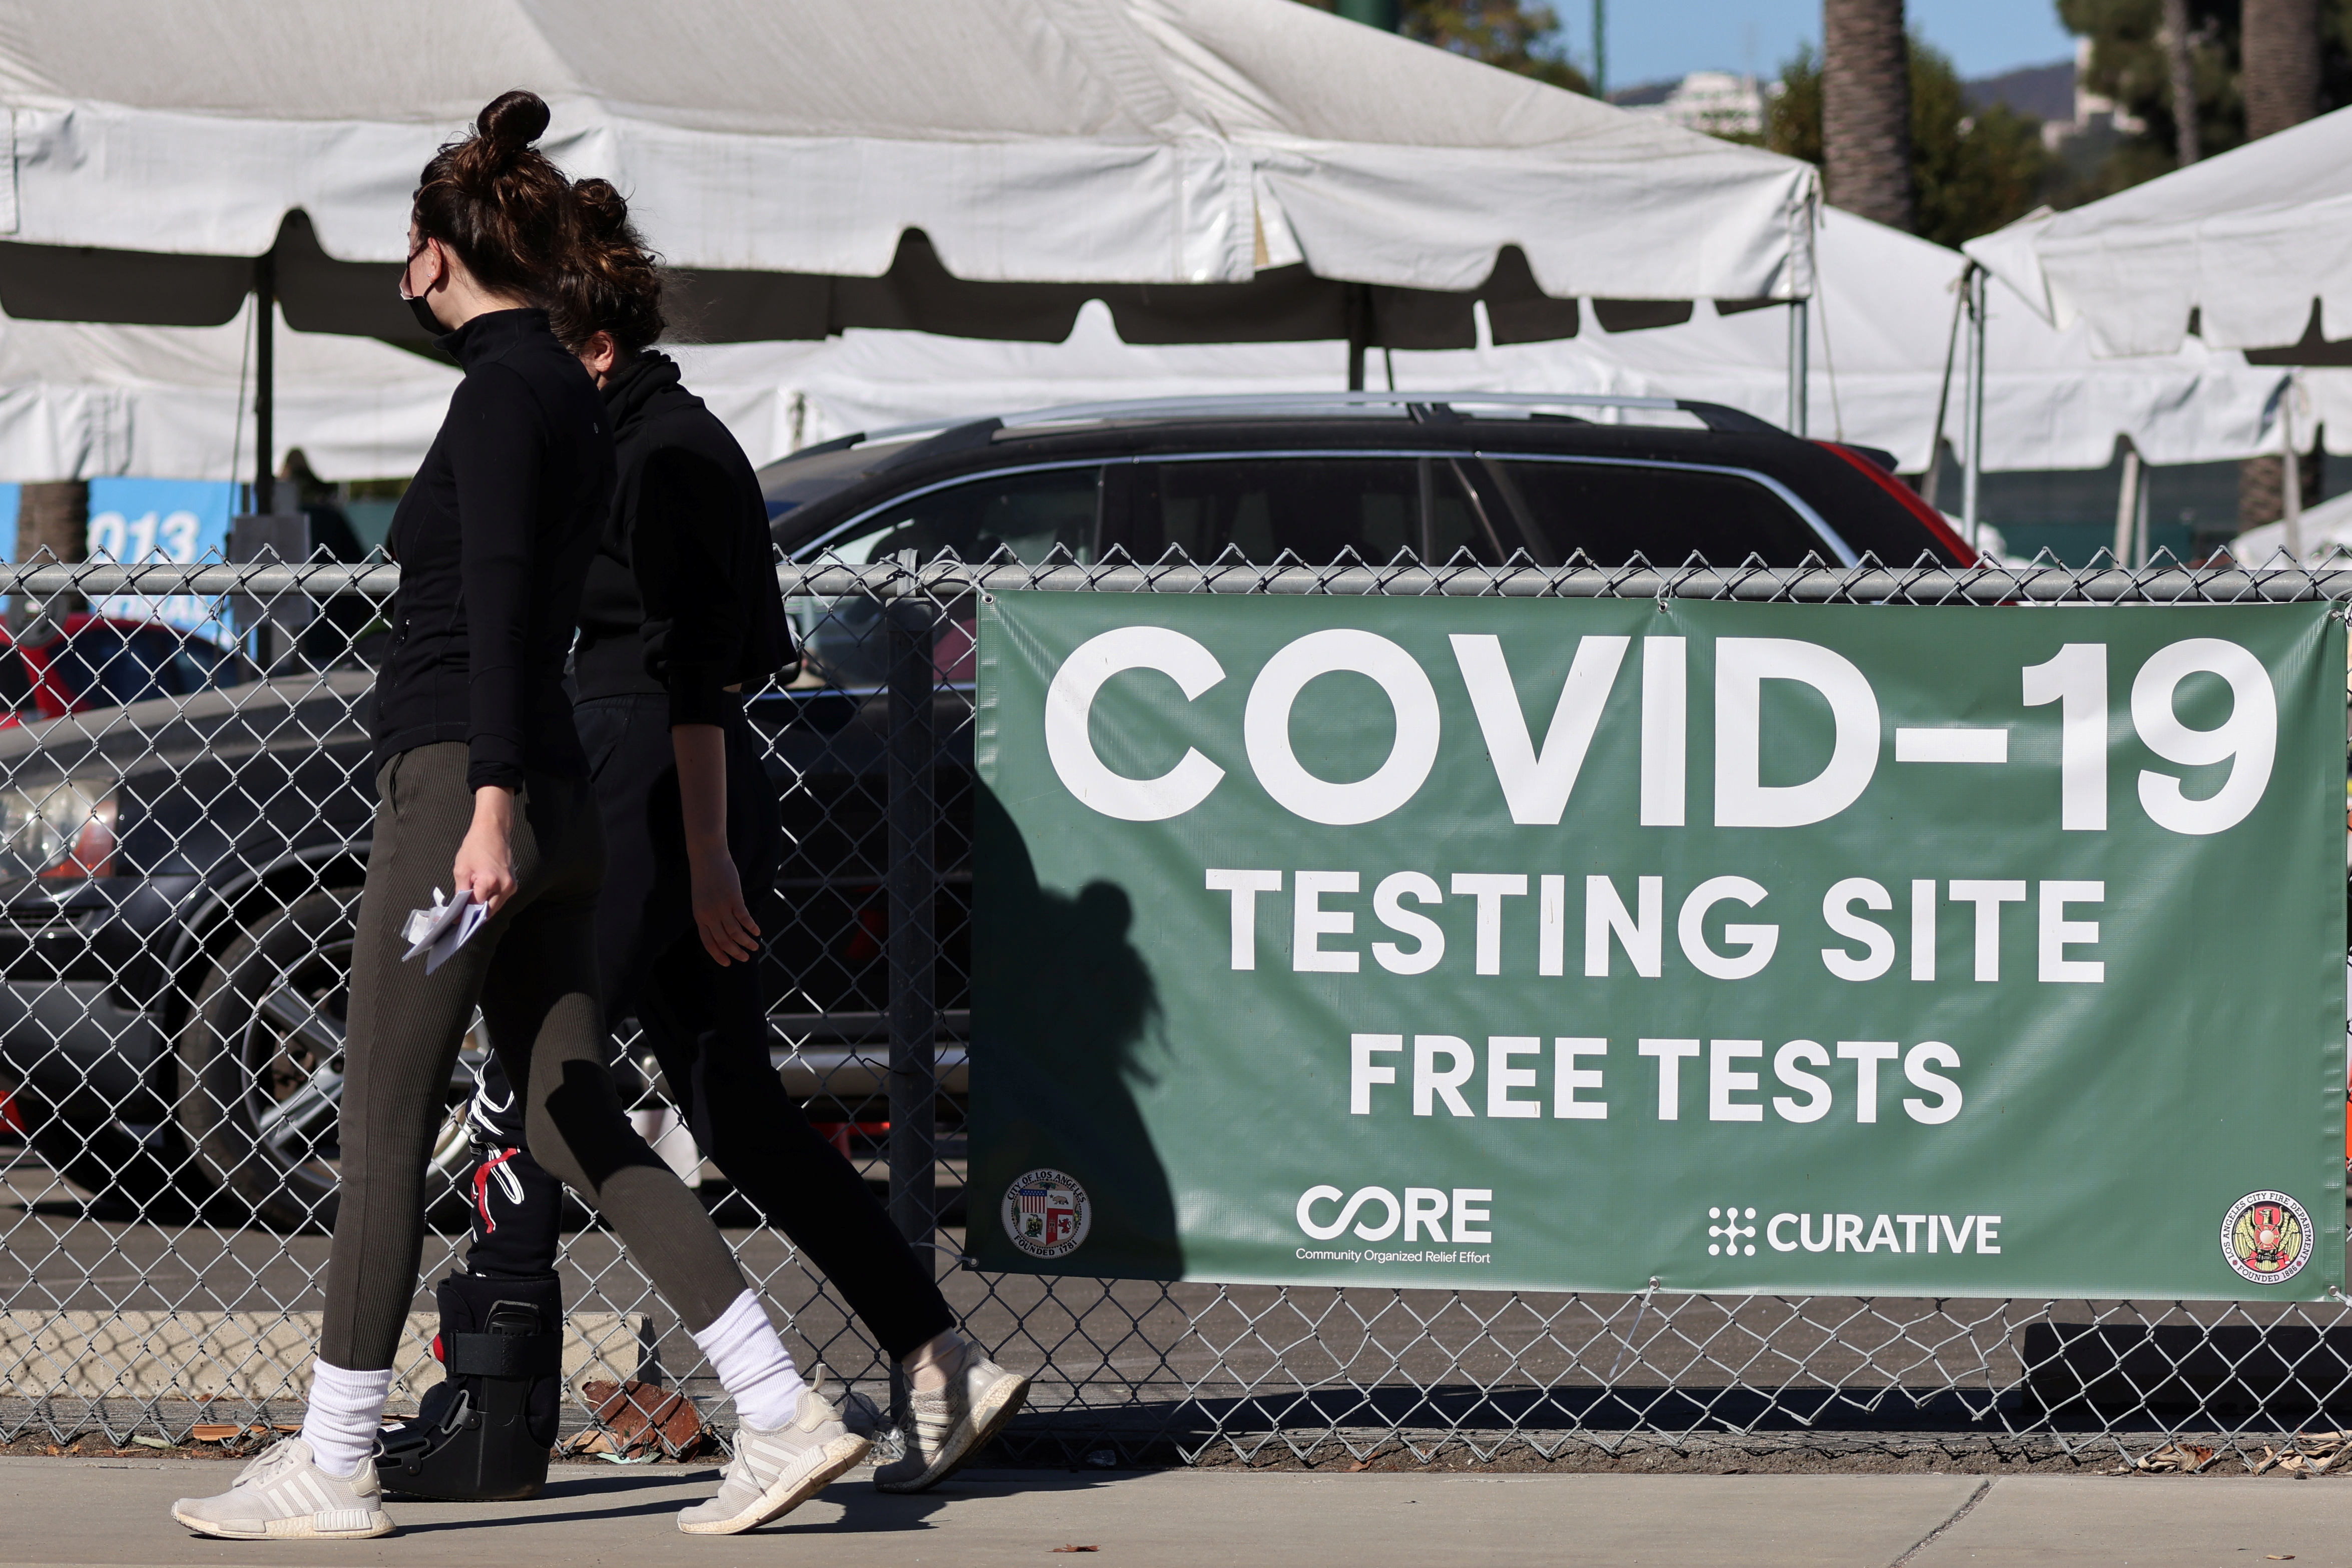 Women walk past a novel coronavirus testing site in Los Angeles, California, U.S., December 1, 2020. REUTERS/Lucy Nicholson